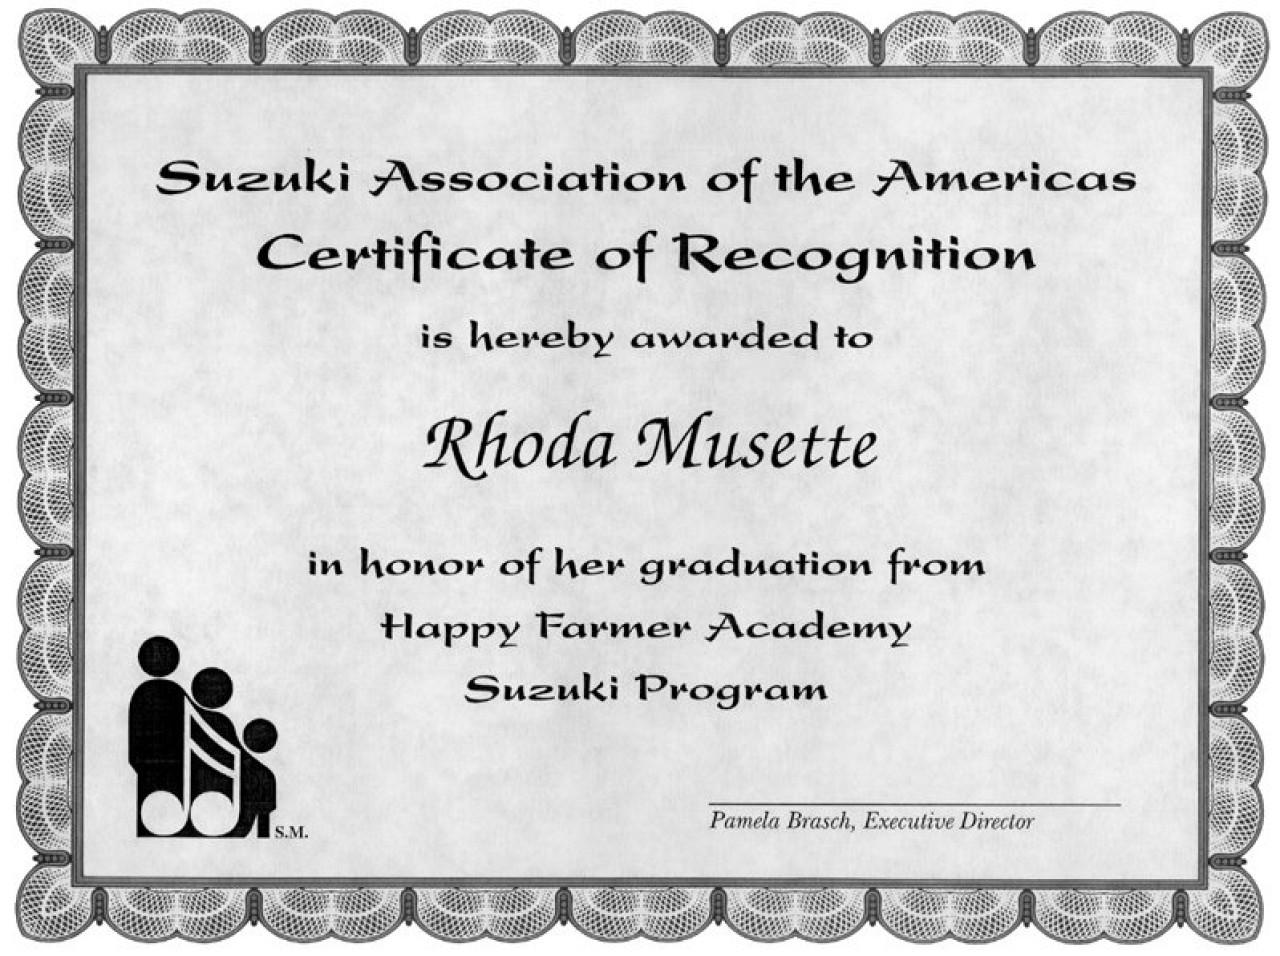 Graduation Certificates | Store | Suzuki Association of the Americas